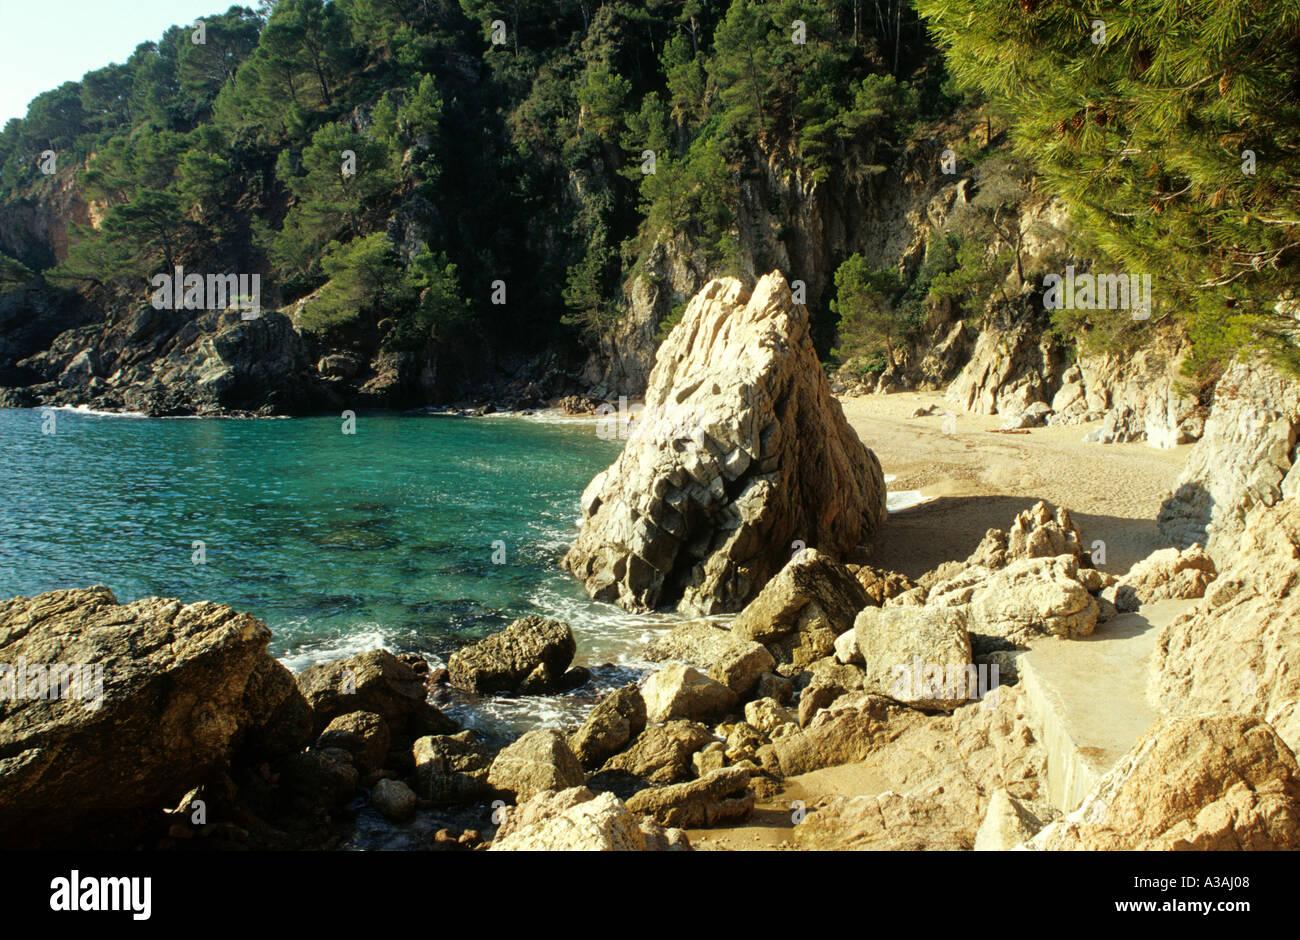 Spanien, Katalonien, Costa Brava, Wasser Stockbild